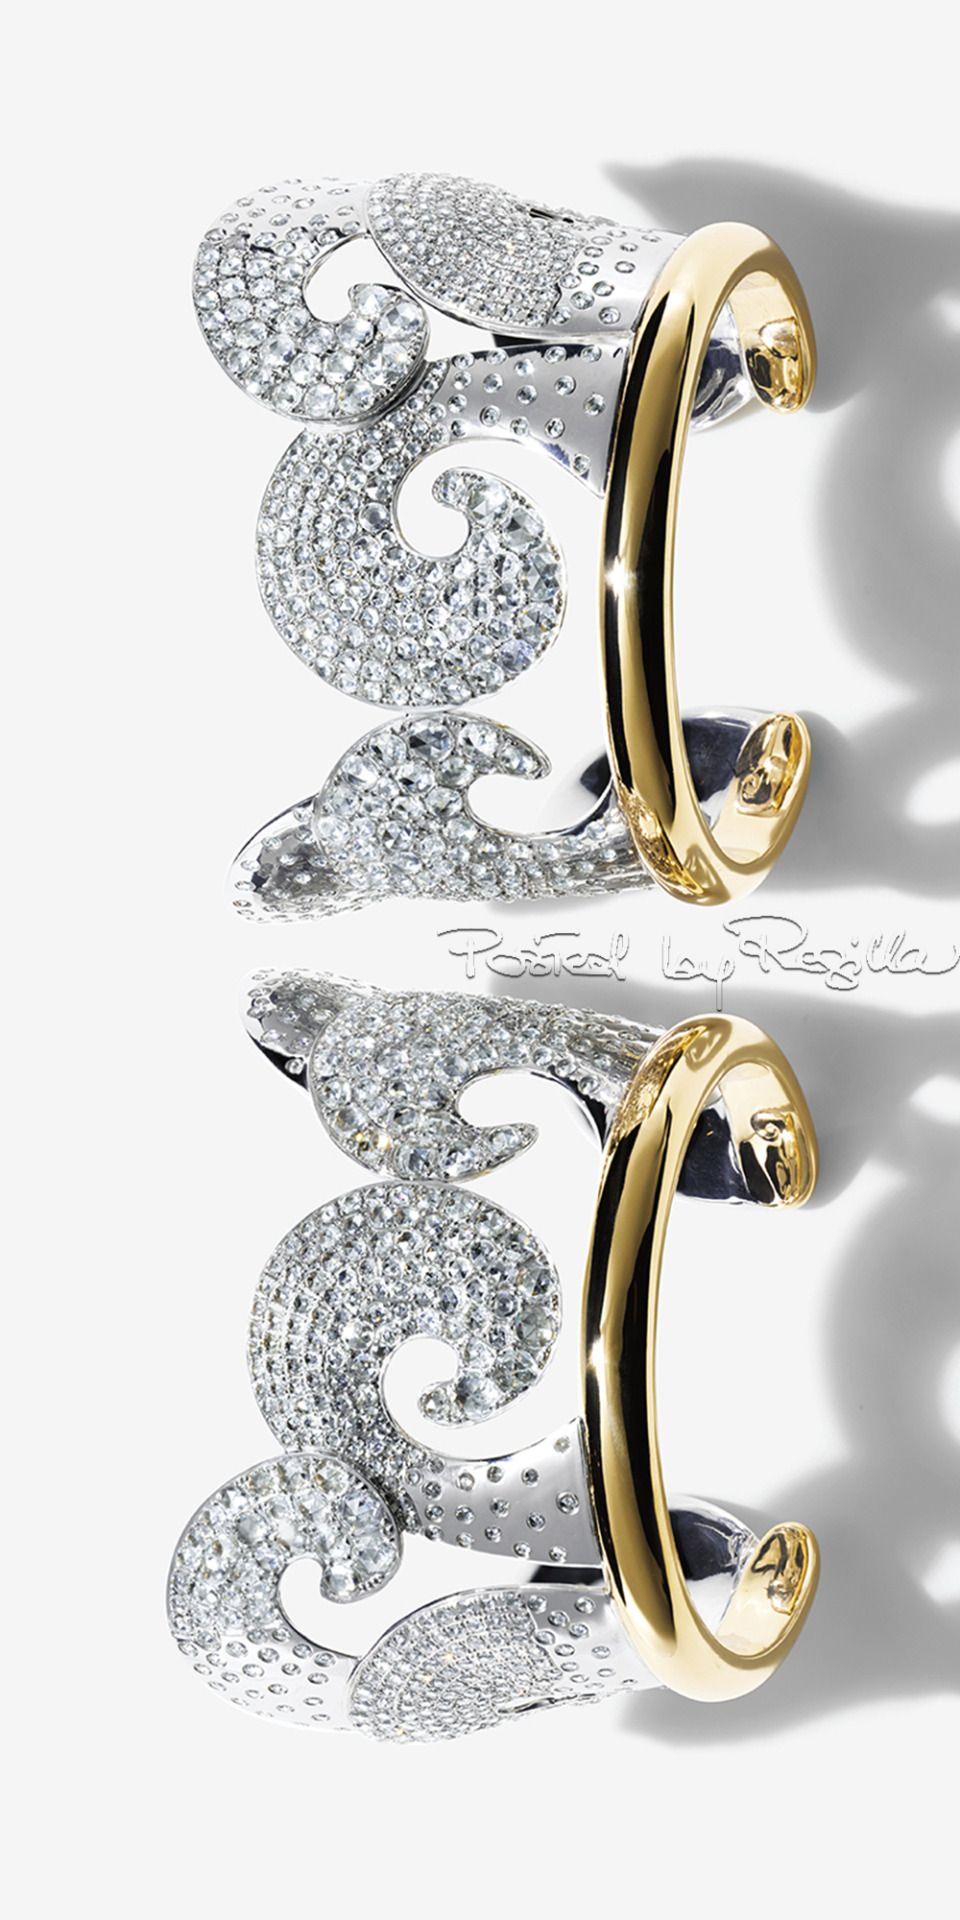 Tiffany Blue Book Diamond Cuffs via Regilla!